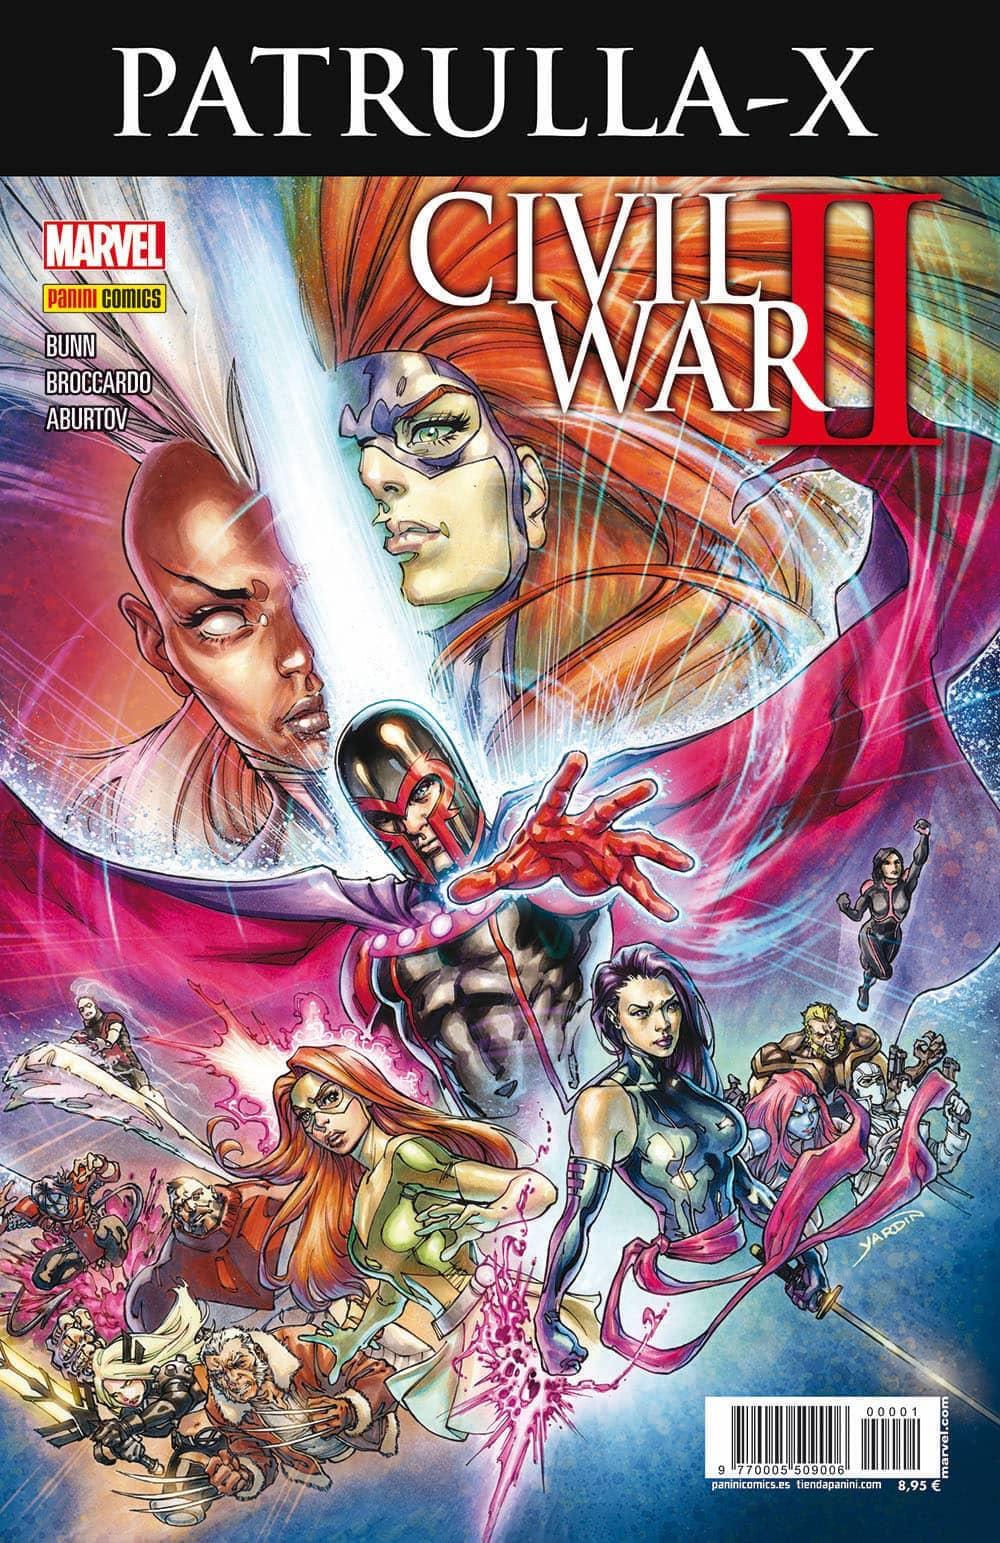 CIVIL WAR II CROSSOVER 01. PATRULLA-X